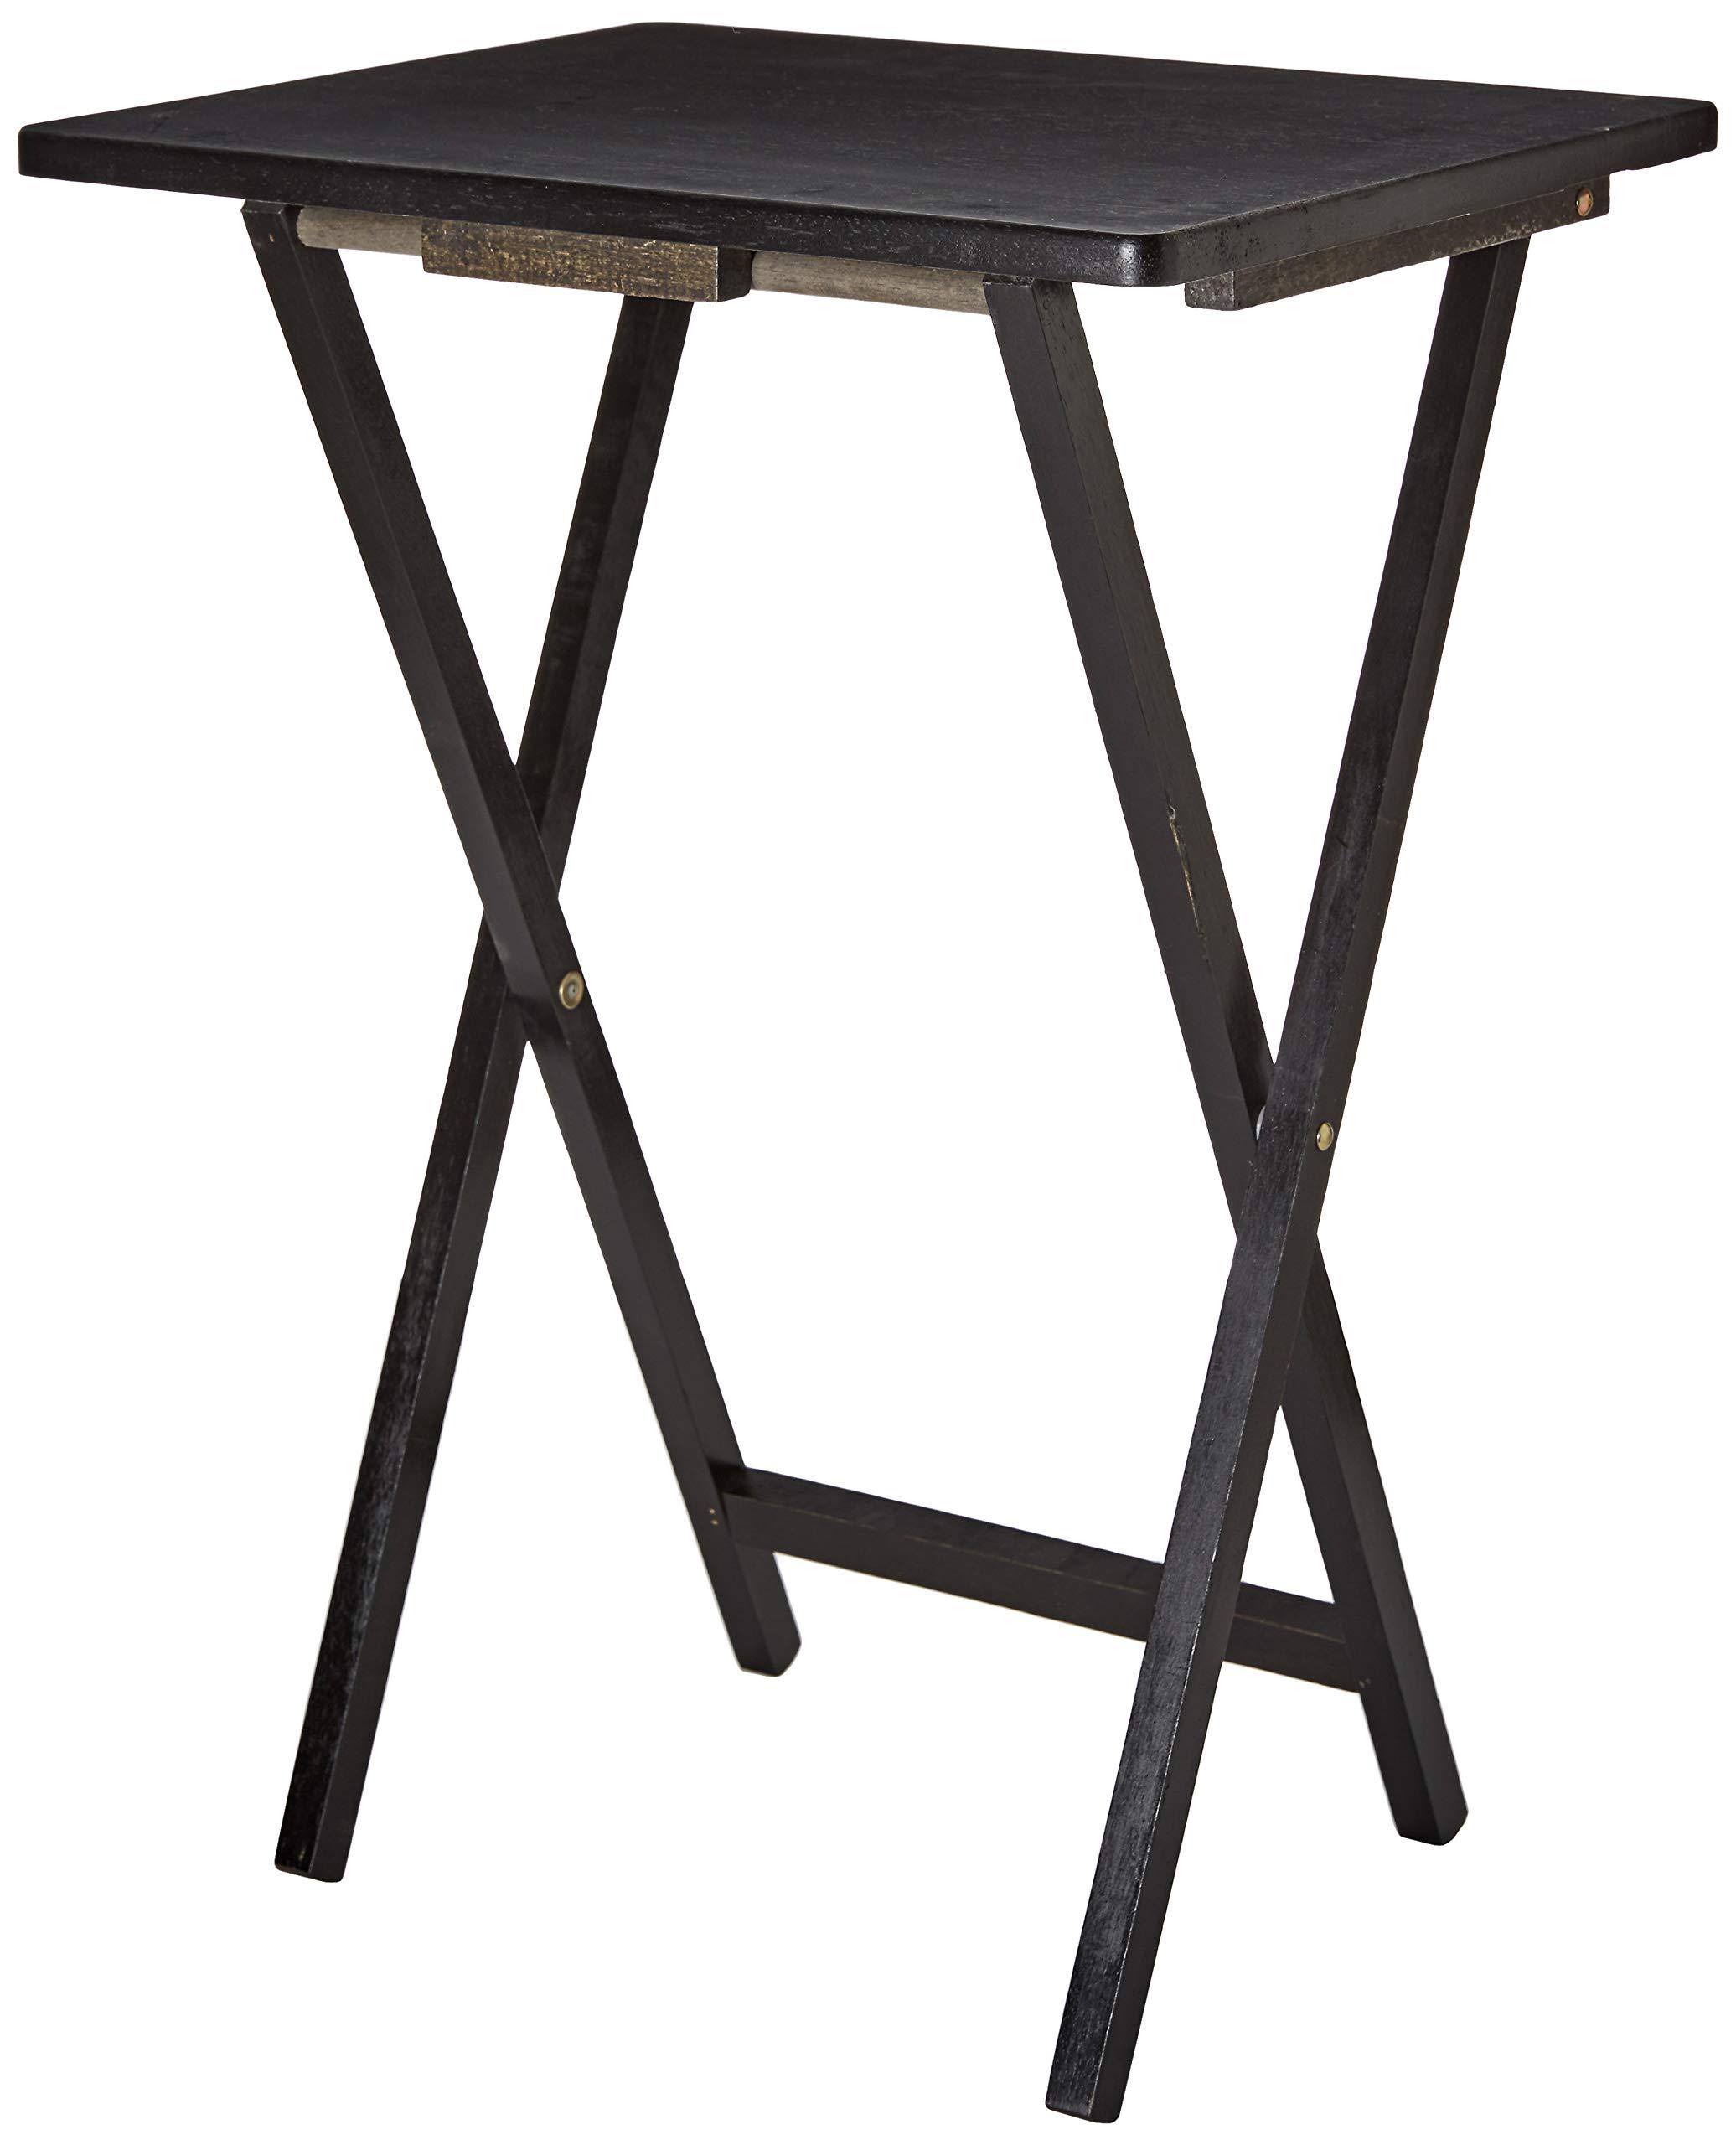 PJ Wood Folding TV Tray & Snack Table - Black by PJ Wood